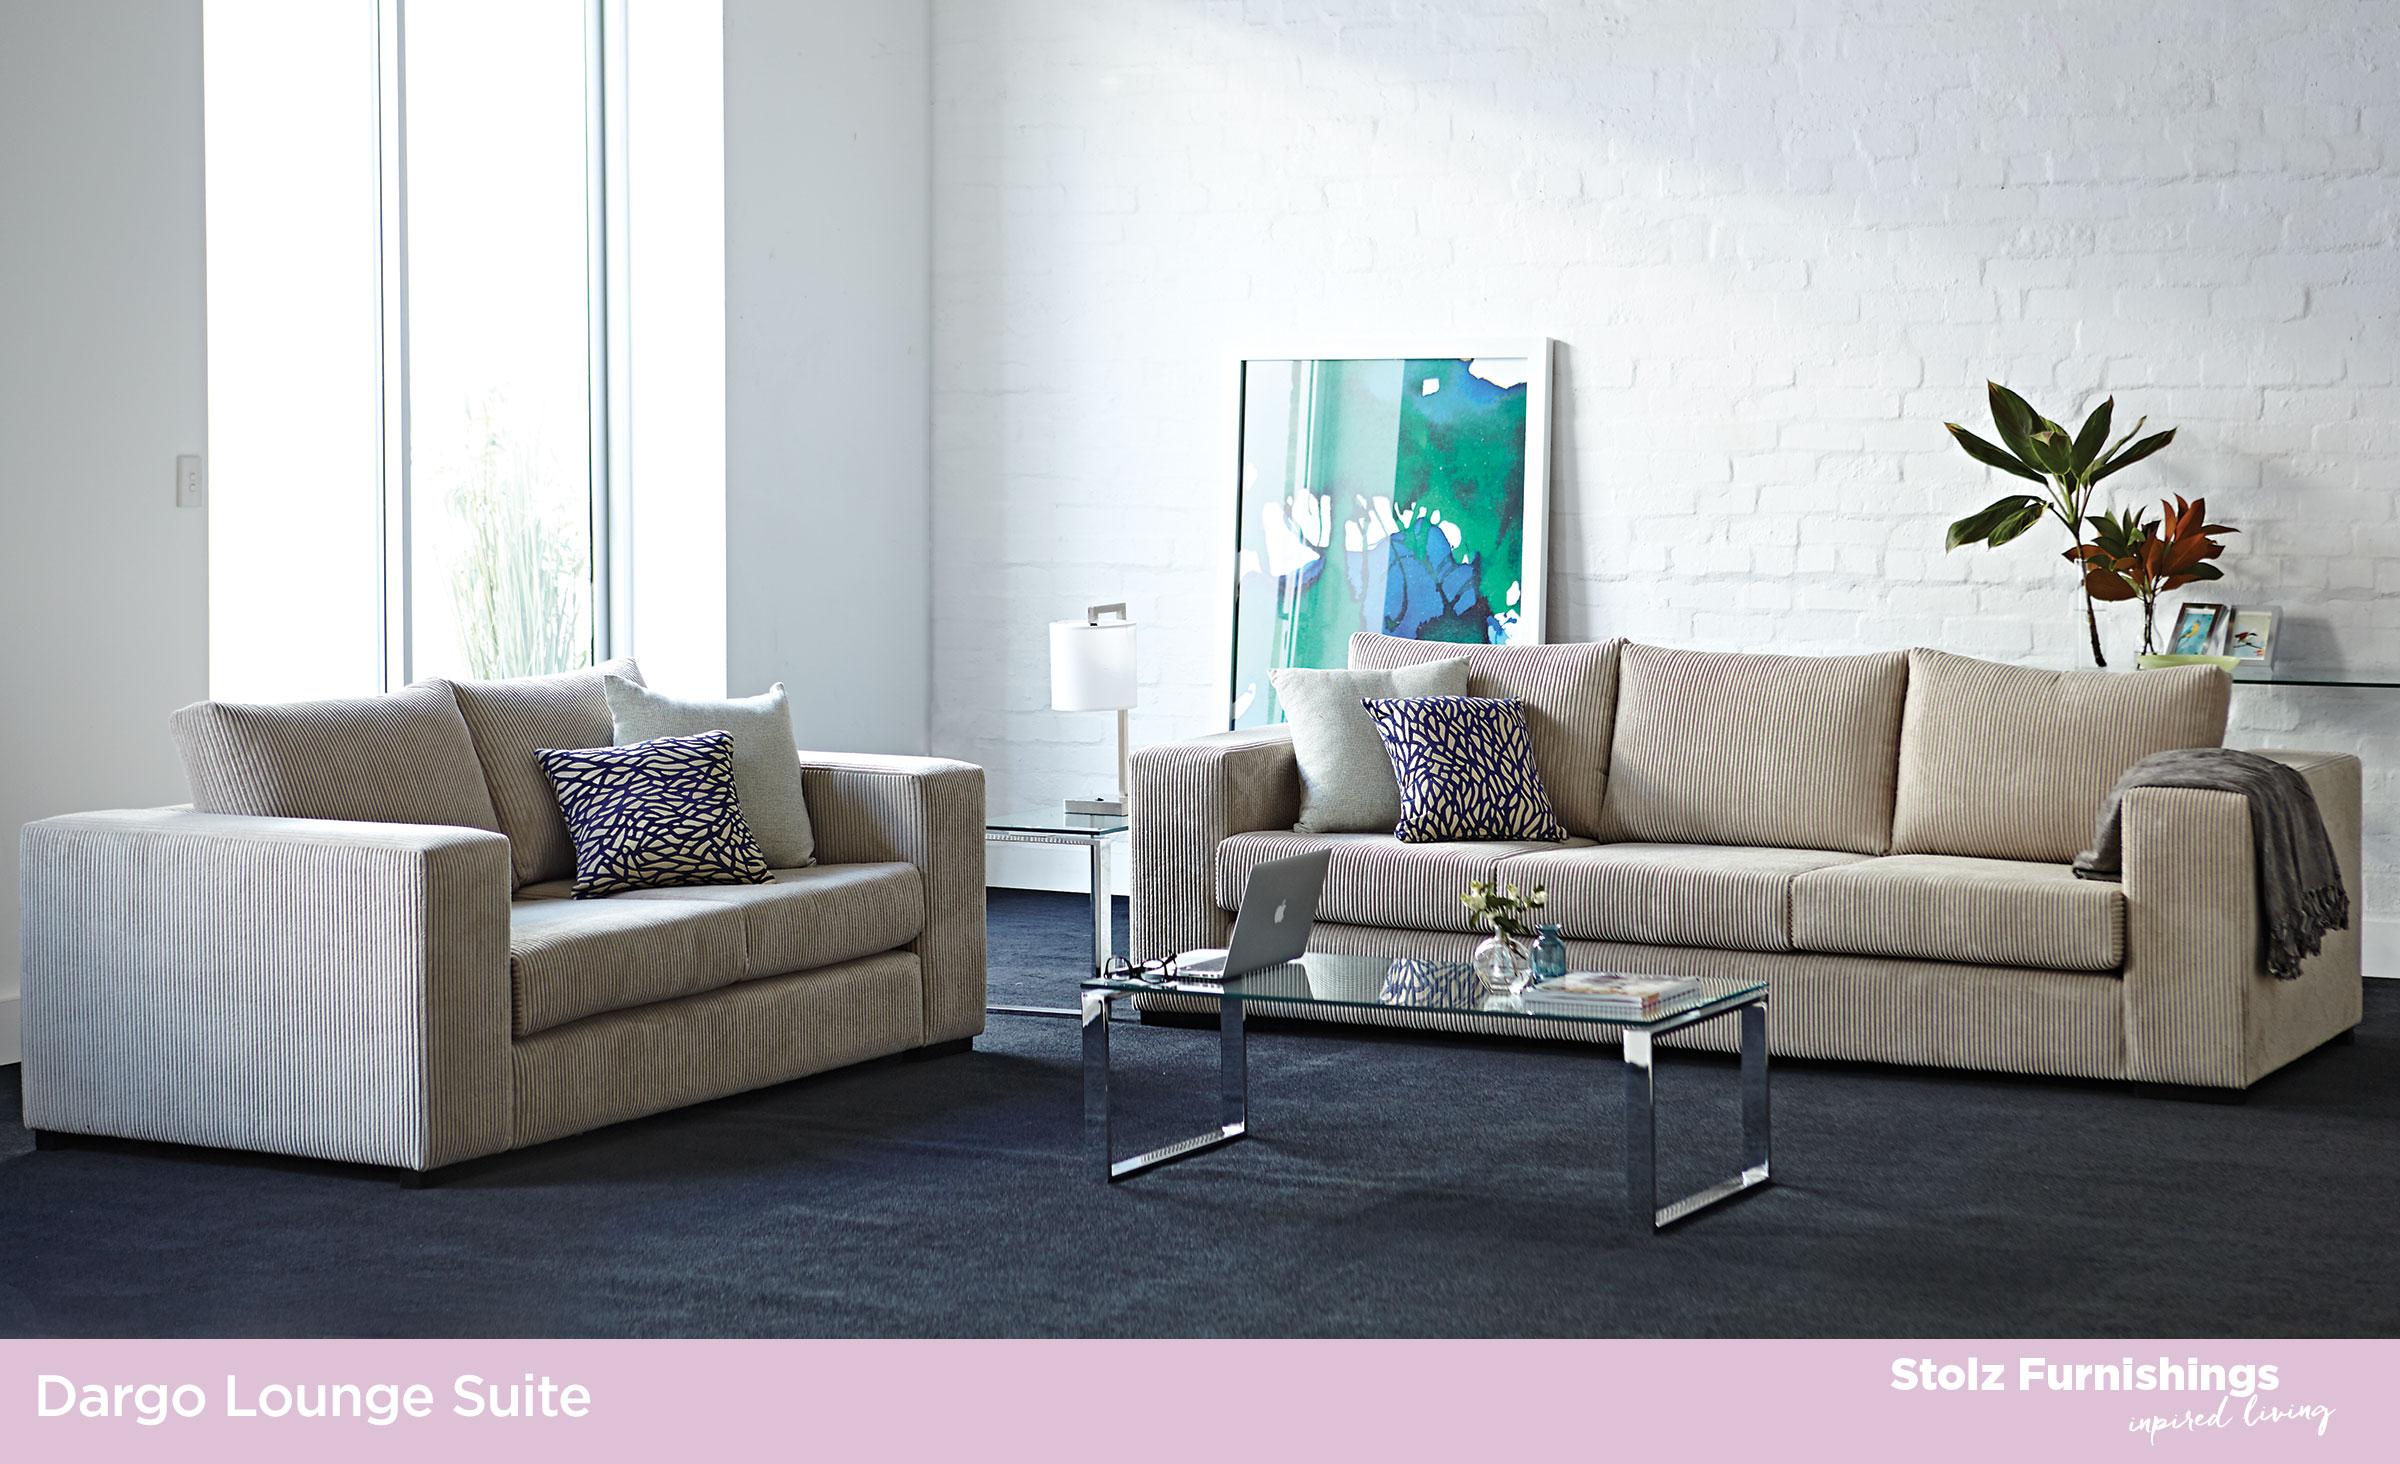 Dargo Lounge Suite